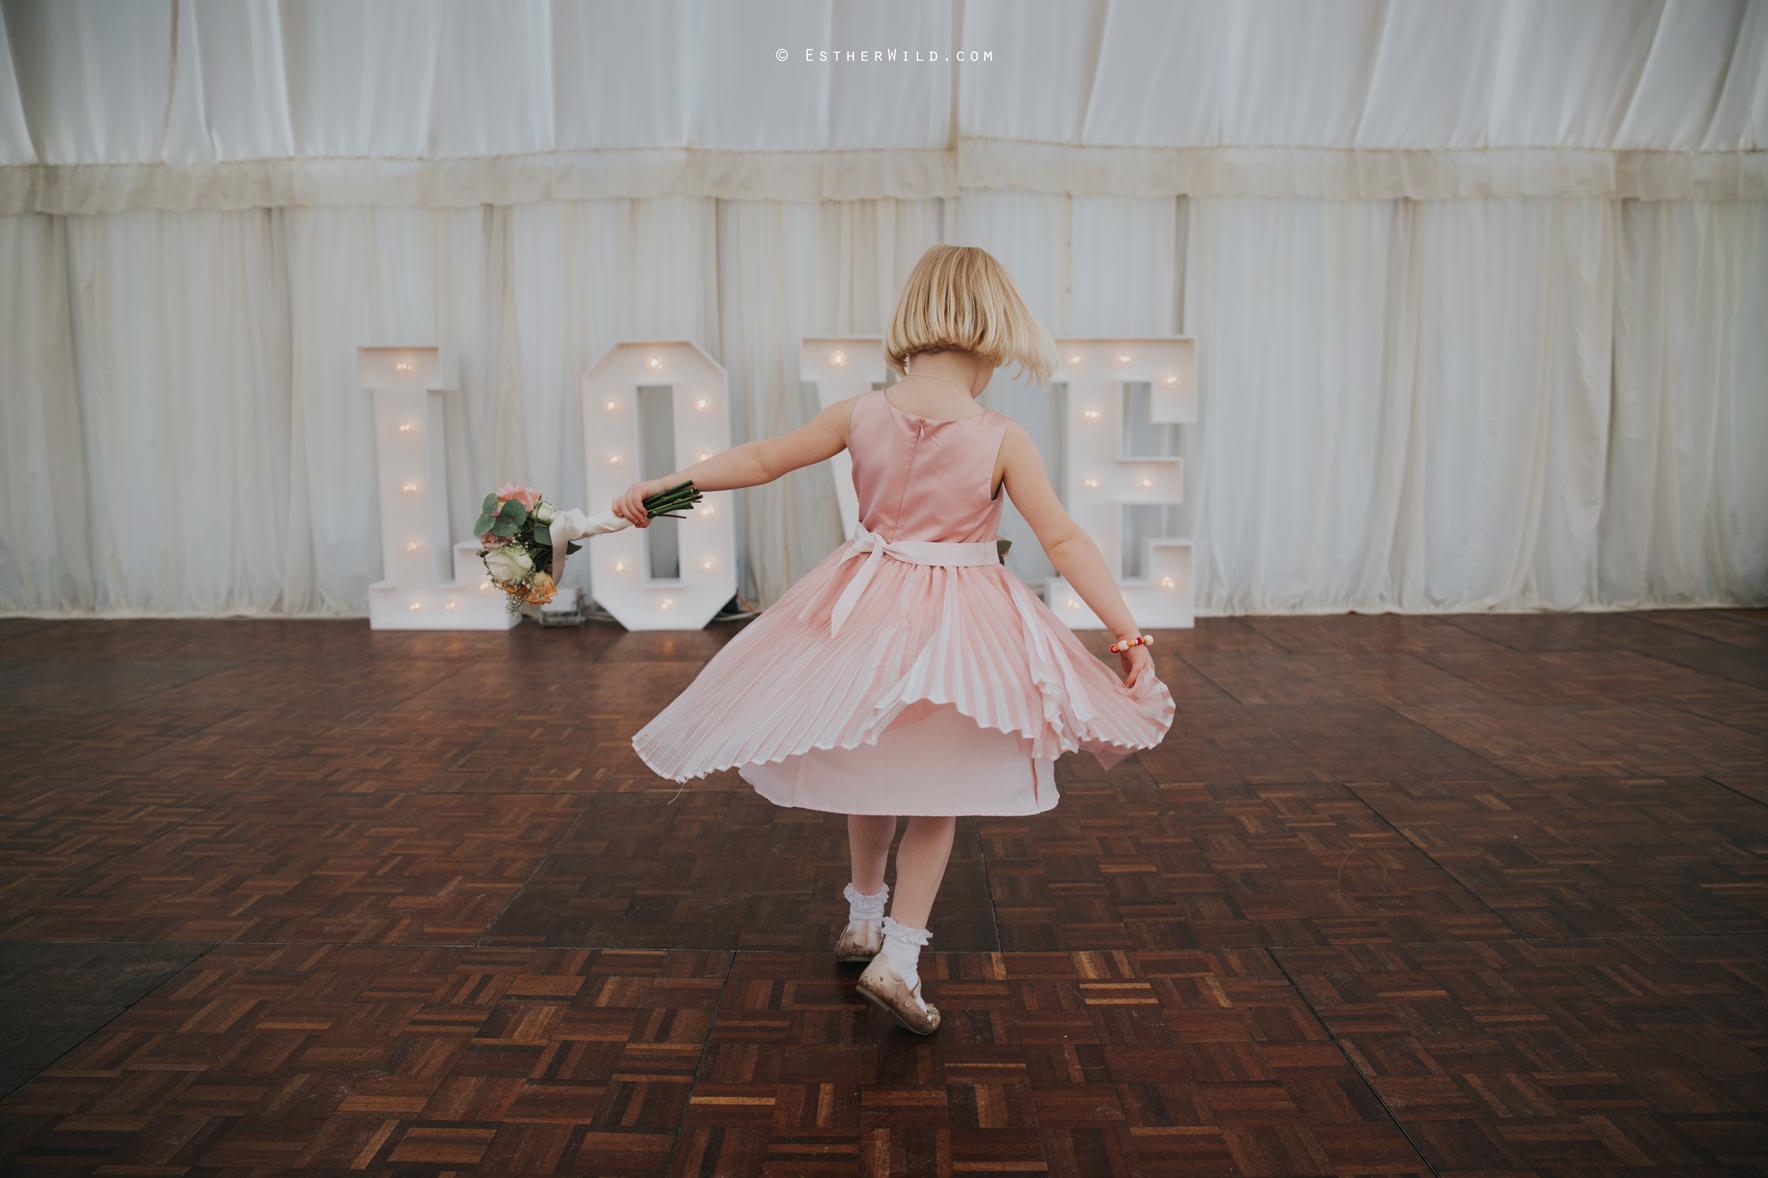 IMG_1542Walpole_St_Andrew_Church_Norfolk_Wedding_Copyright_Esther_Wild_Photographer_.jpg